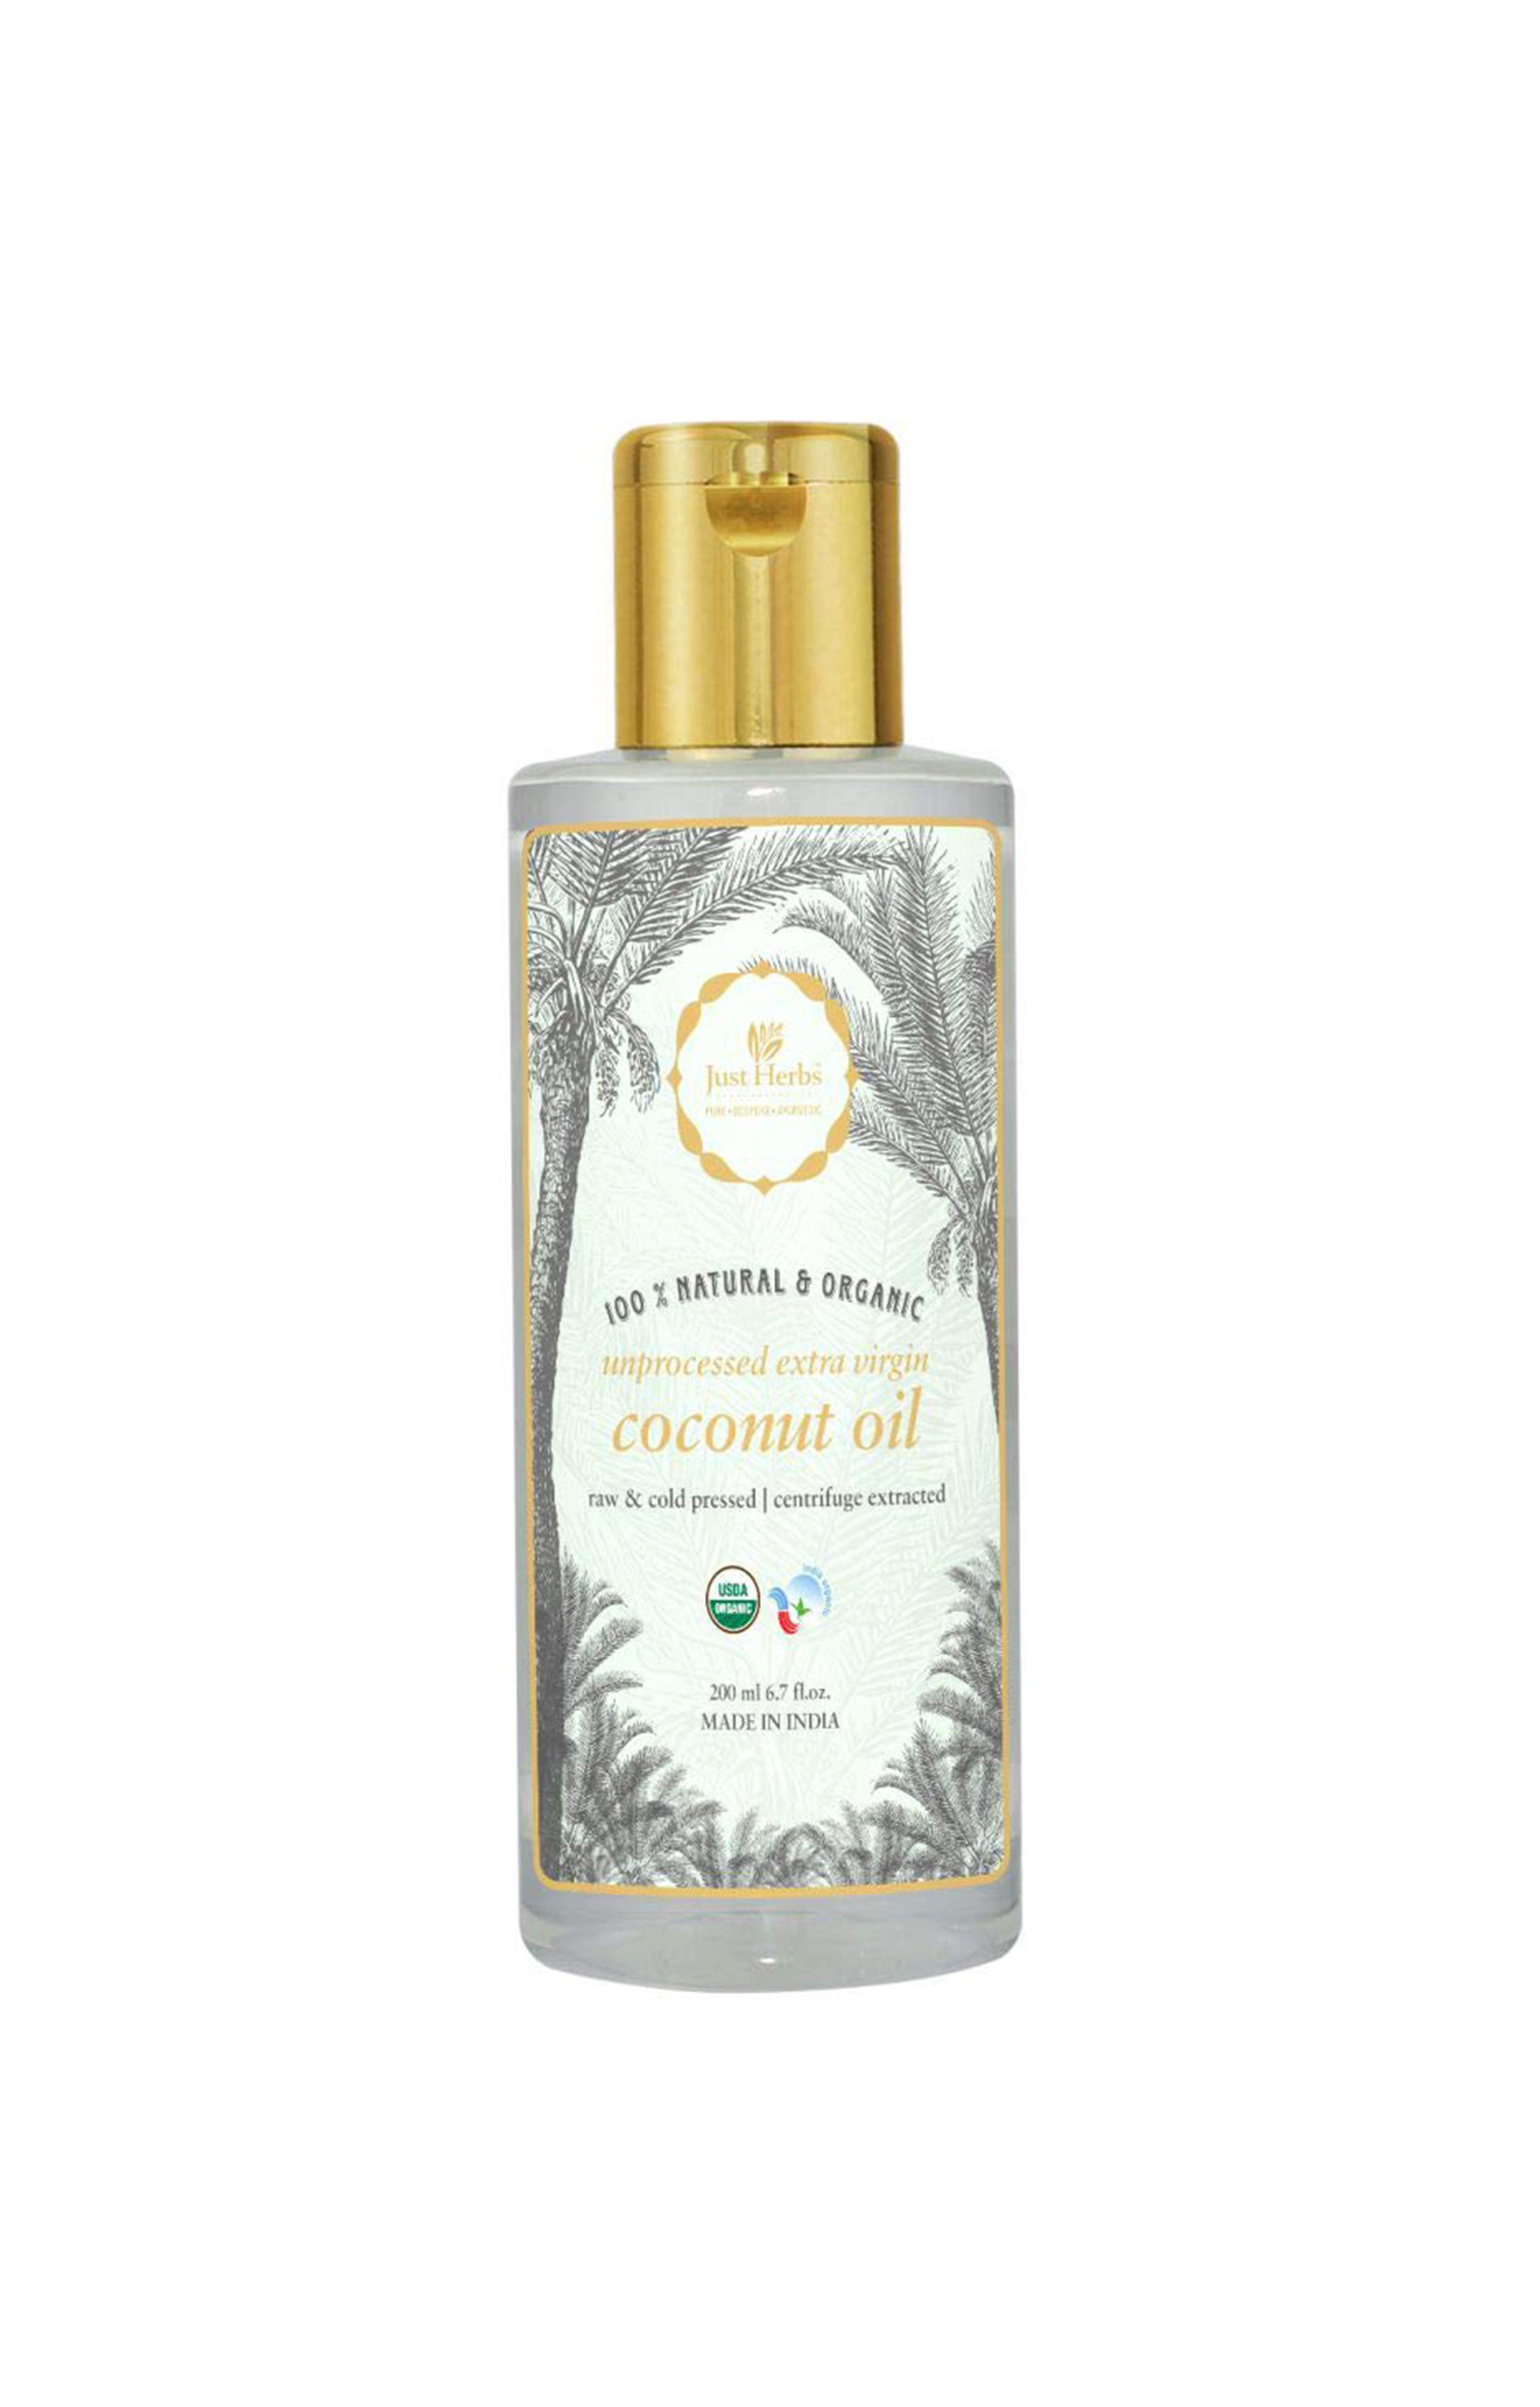 Just Herbs | Extra Virgin Coconut Oil: Unprocessed & Certified Organic